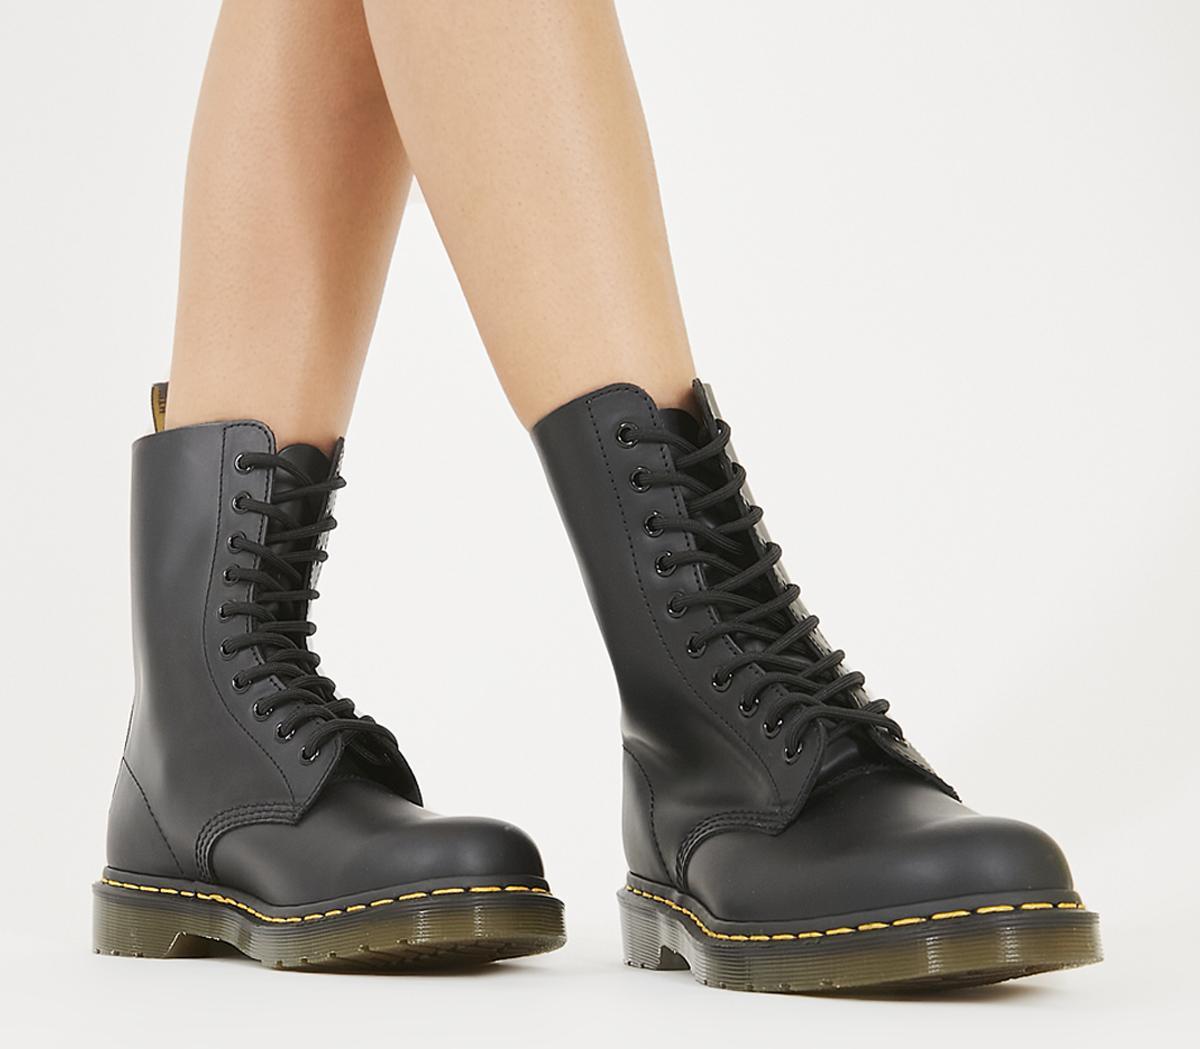 Dr. Martens 1490 10 Eye Boot Black